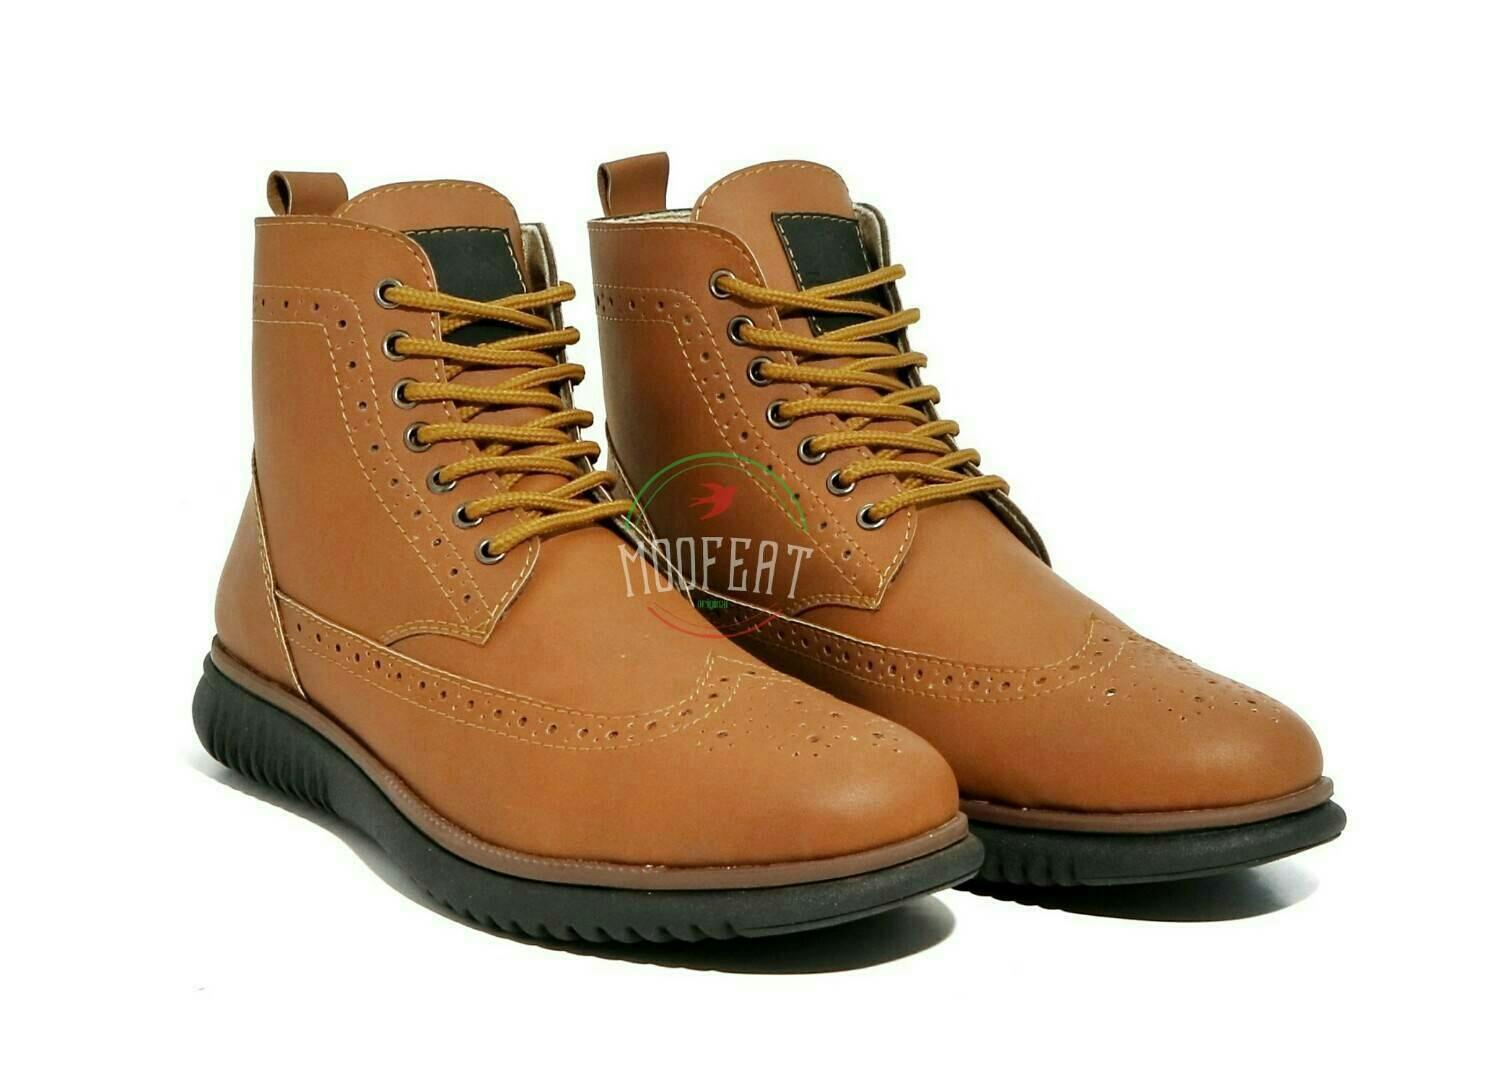 Coba Bandingkan Barang Sepatu Boots Moofeat Paling Murah - BhinekaShop 594a108ba0